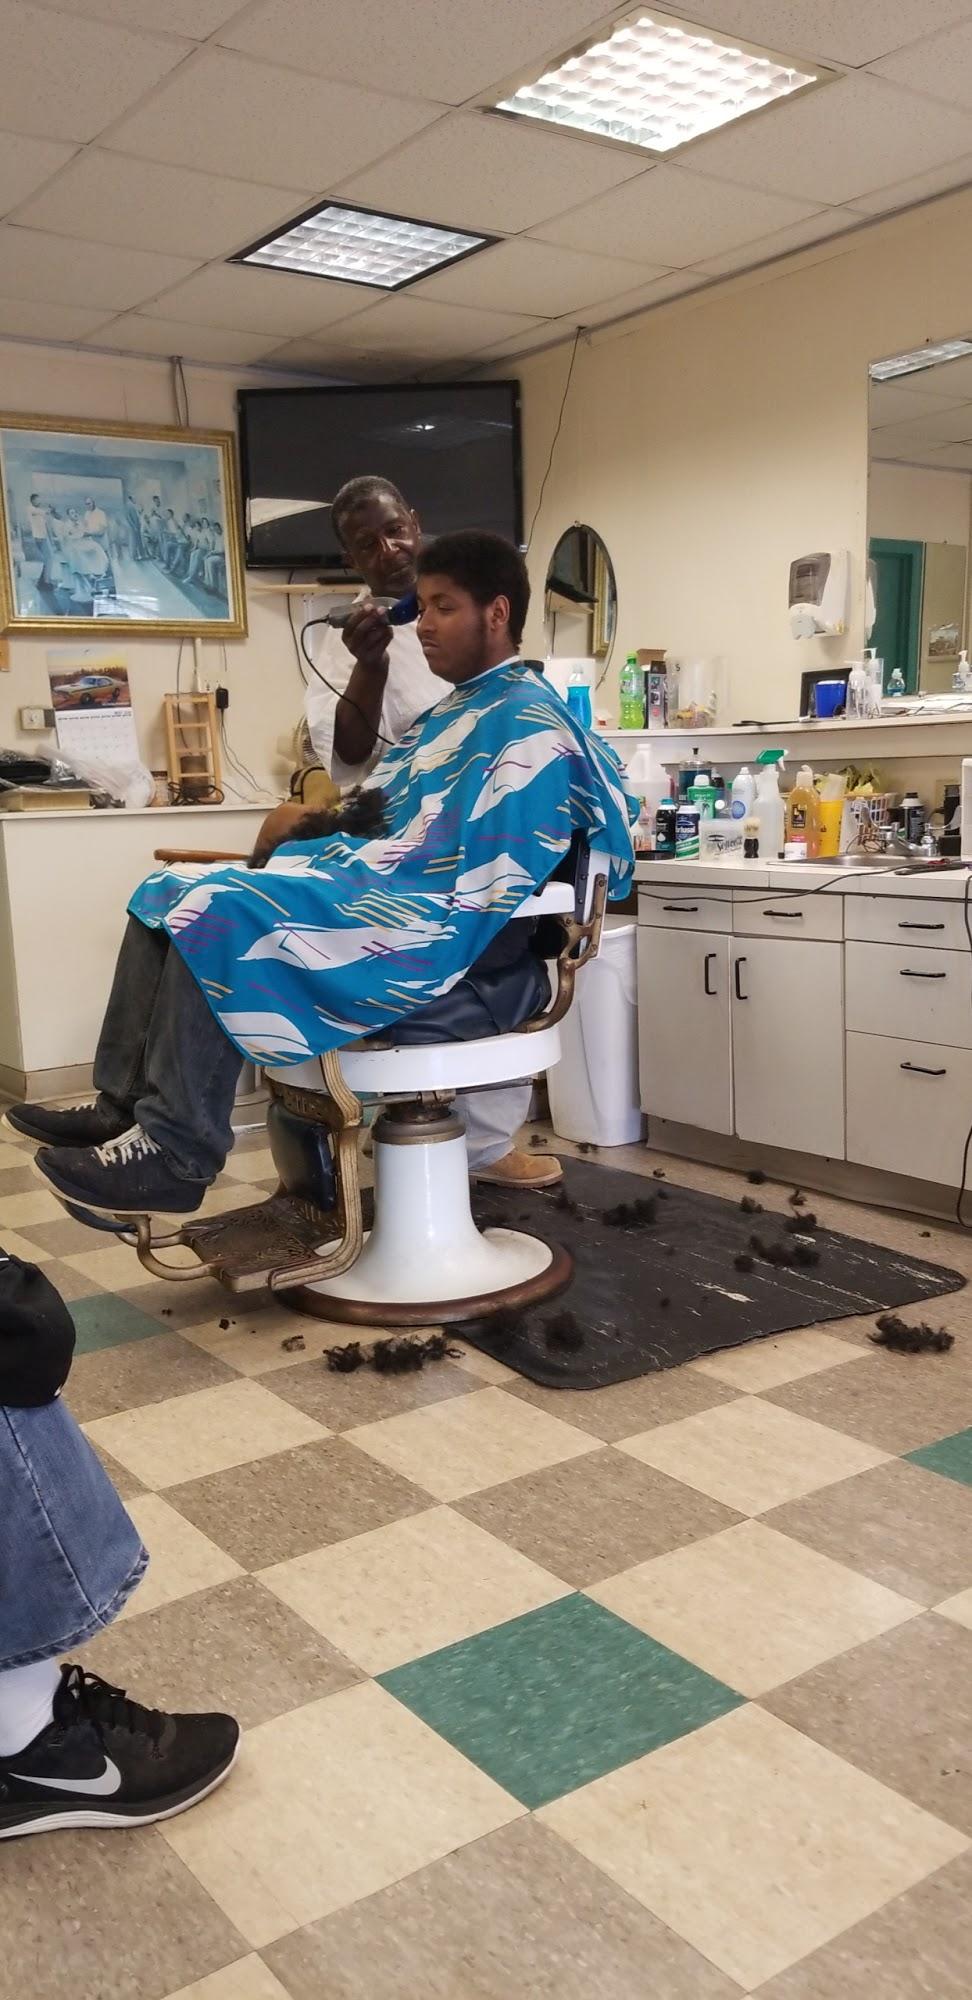 Shorty's Barber Service 104-106 S Main St, Woodruff